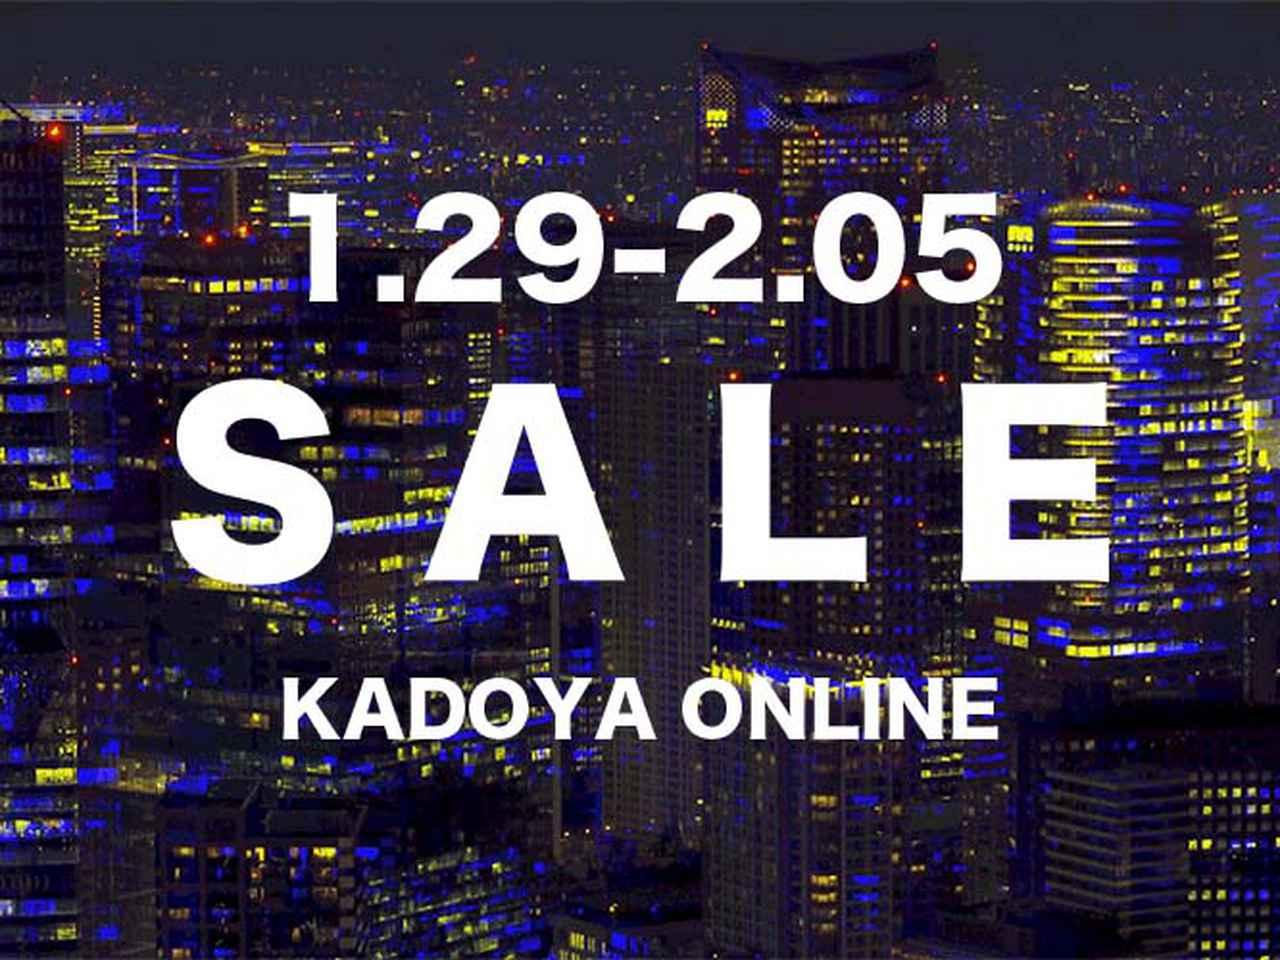 「KADOYA ONLINE LAST SALE」が1月29日(水)18時から2月5日(水)24時まで開催されます!